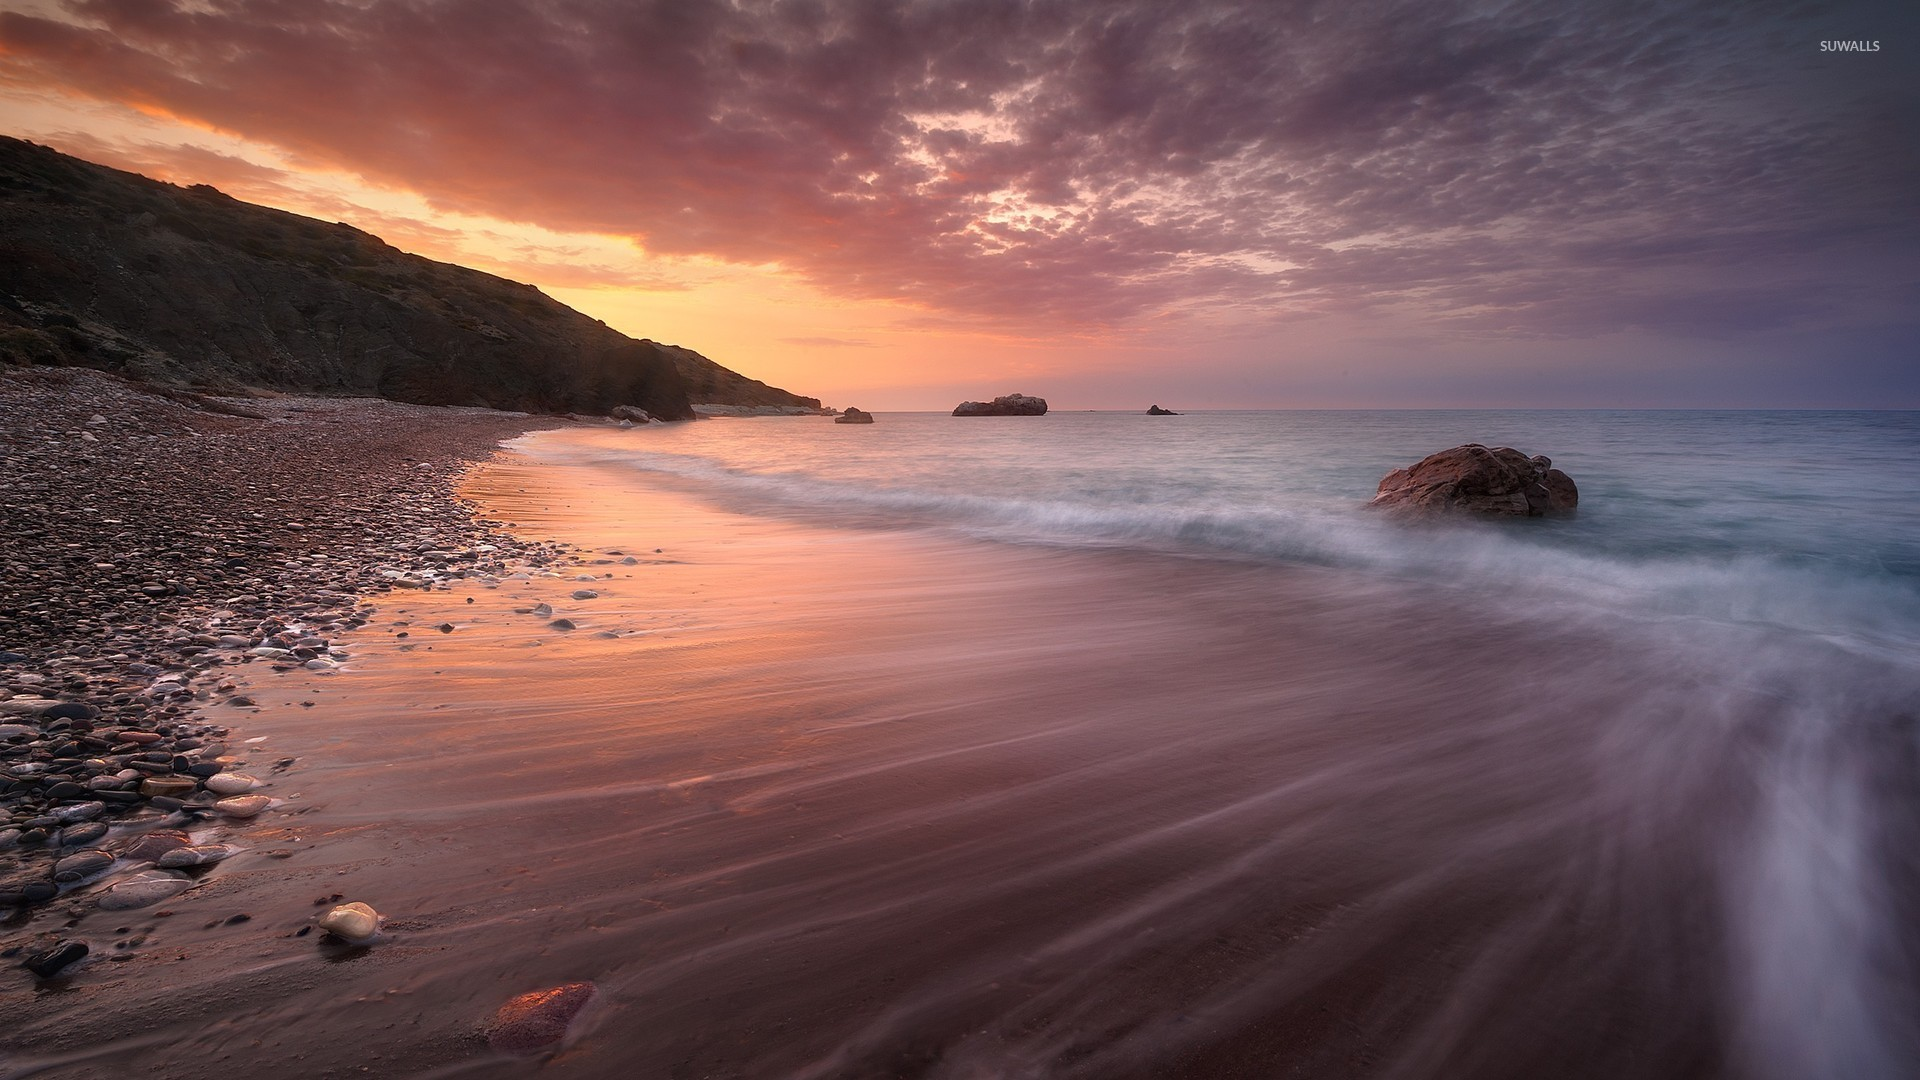 Sandy Beach Wallpaper: Sandy Beach Splitting The Ocean From The Rocks Wallpaper